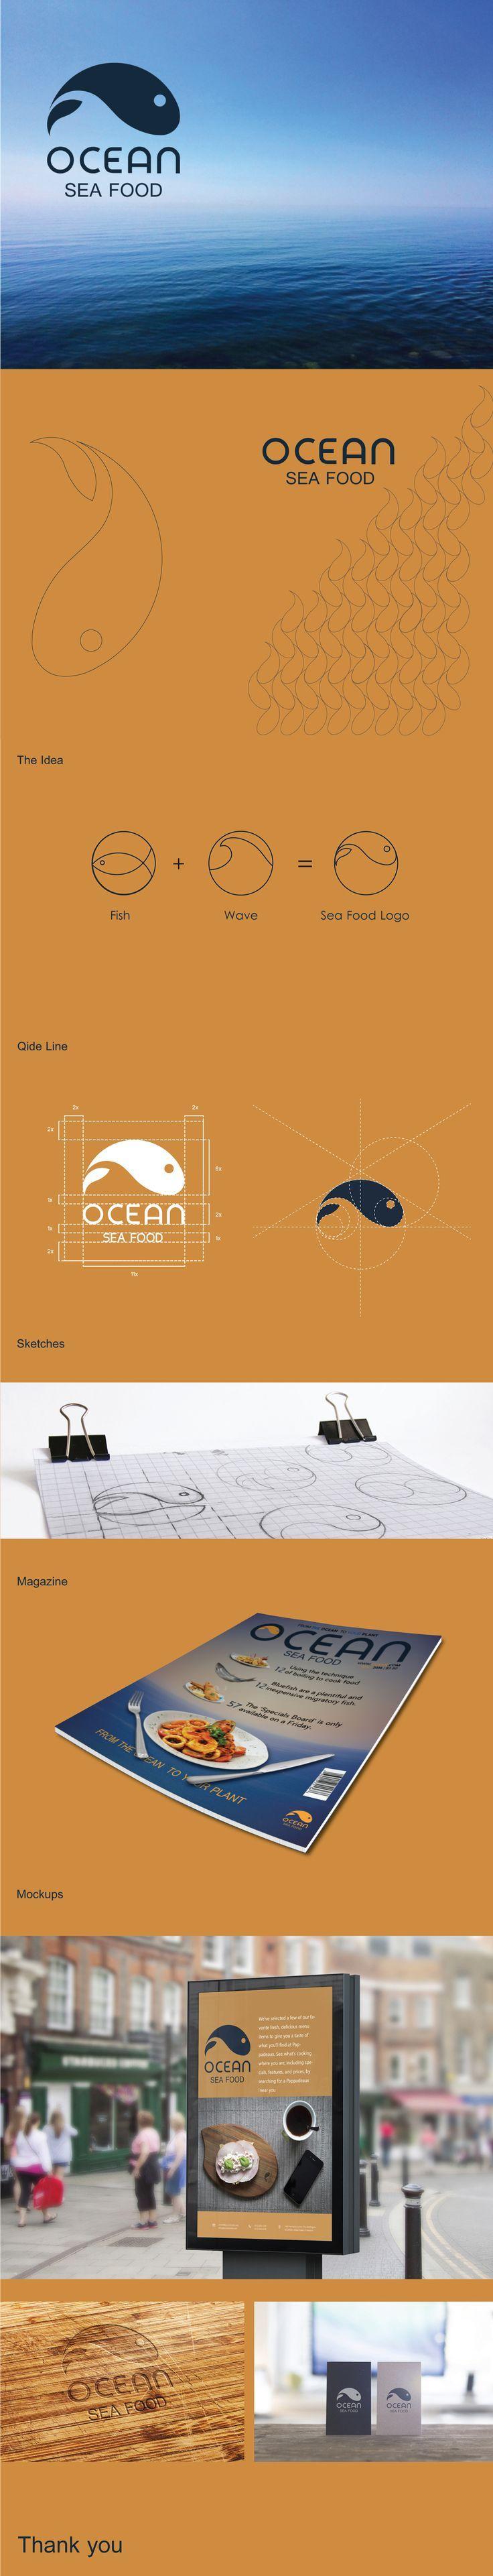 2346 best graphic design images on pinterest graphics graph